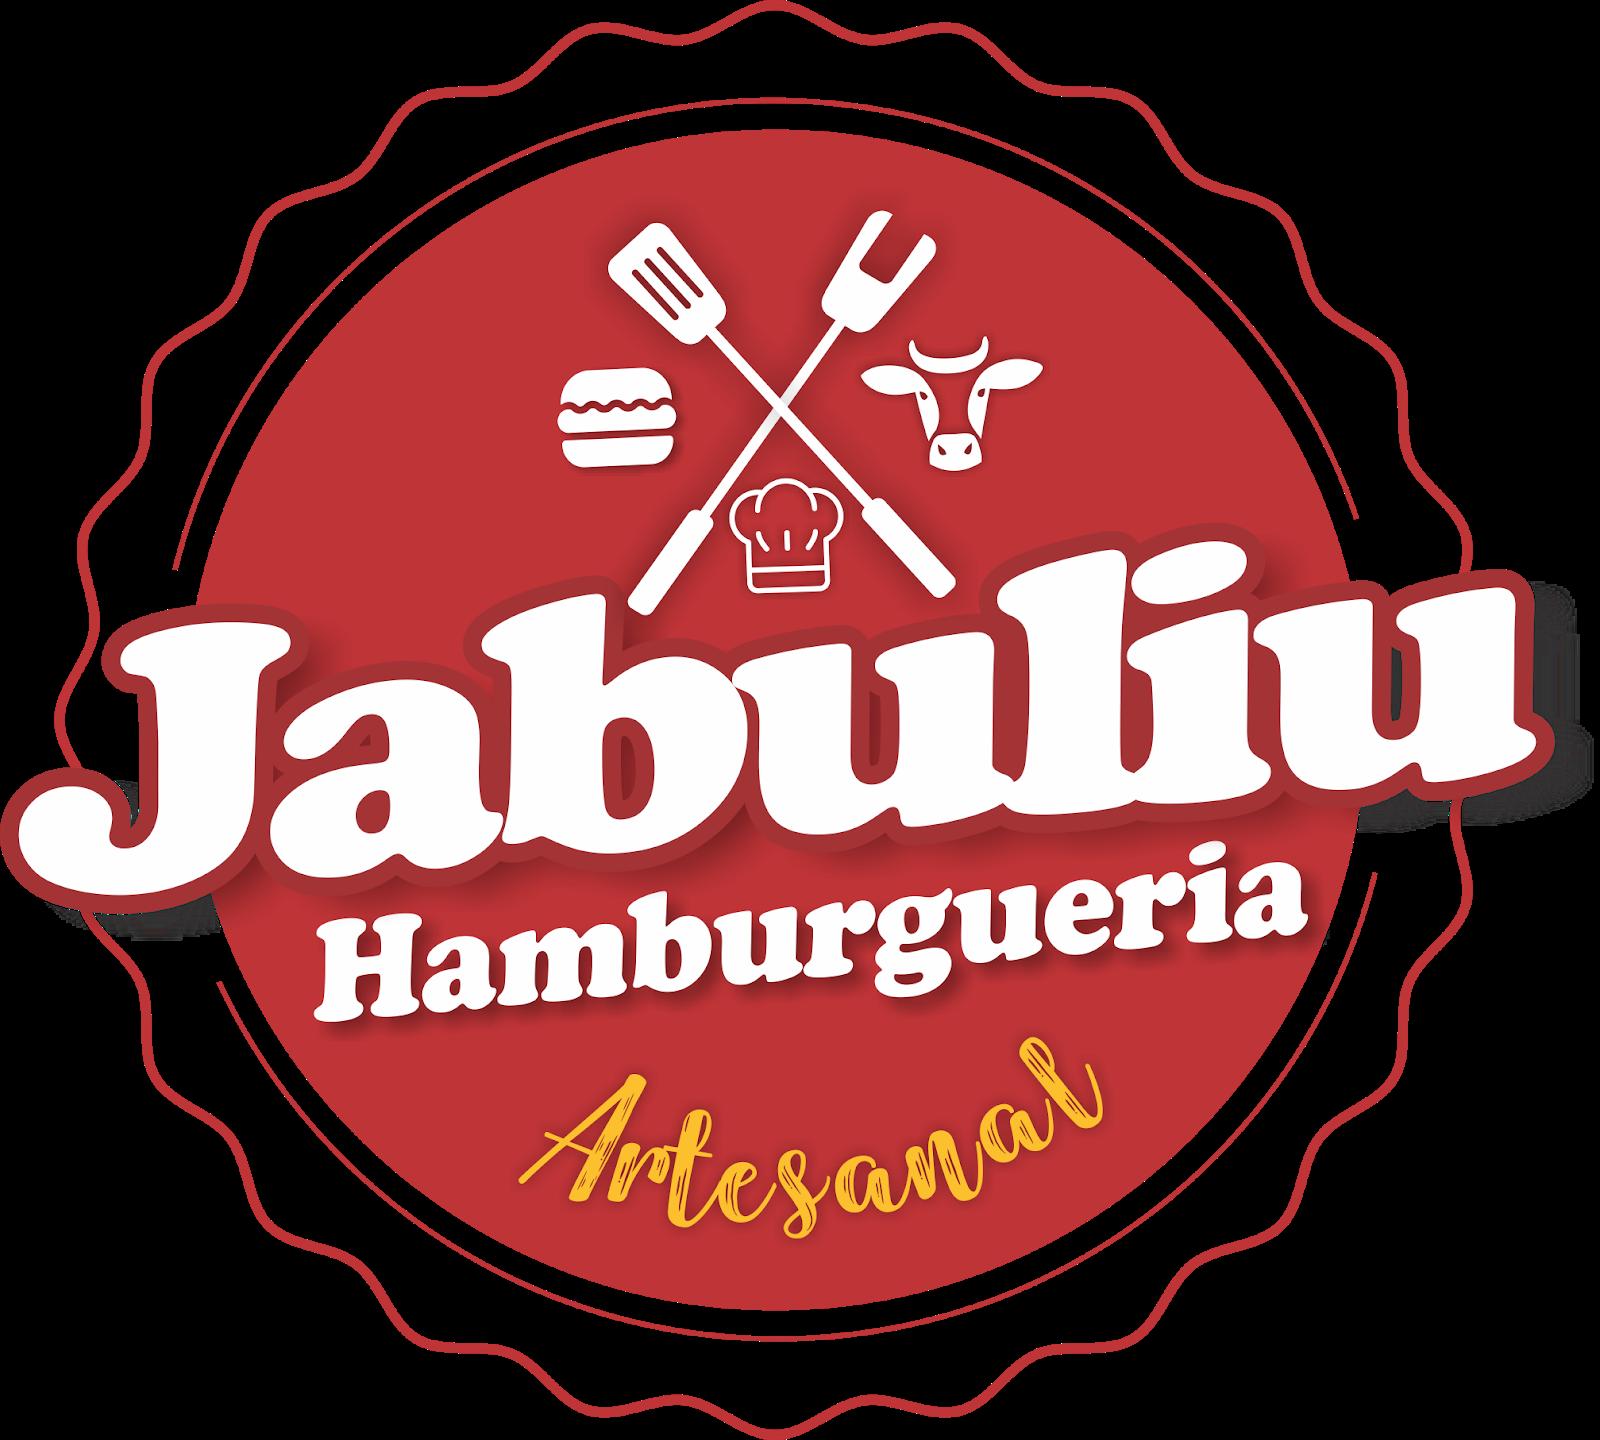 Jabuliu